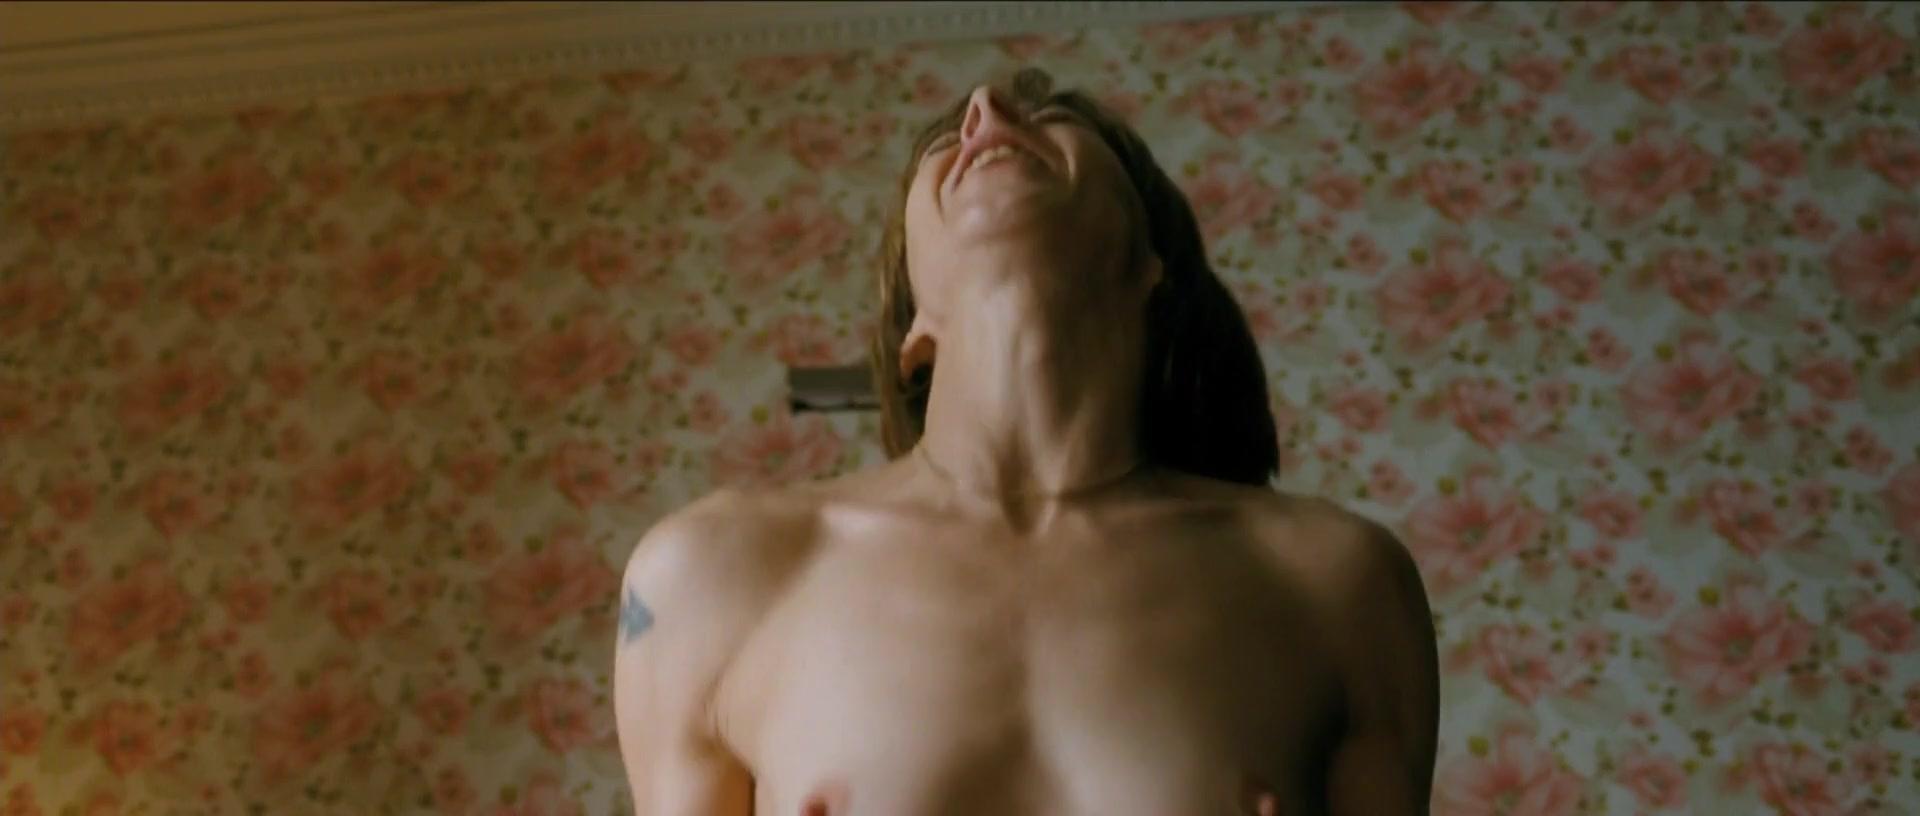 Ideal Jody Nude Pics